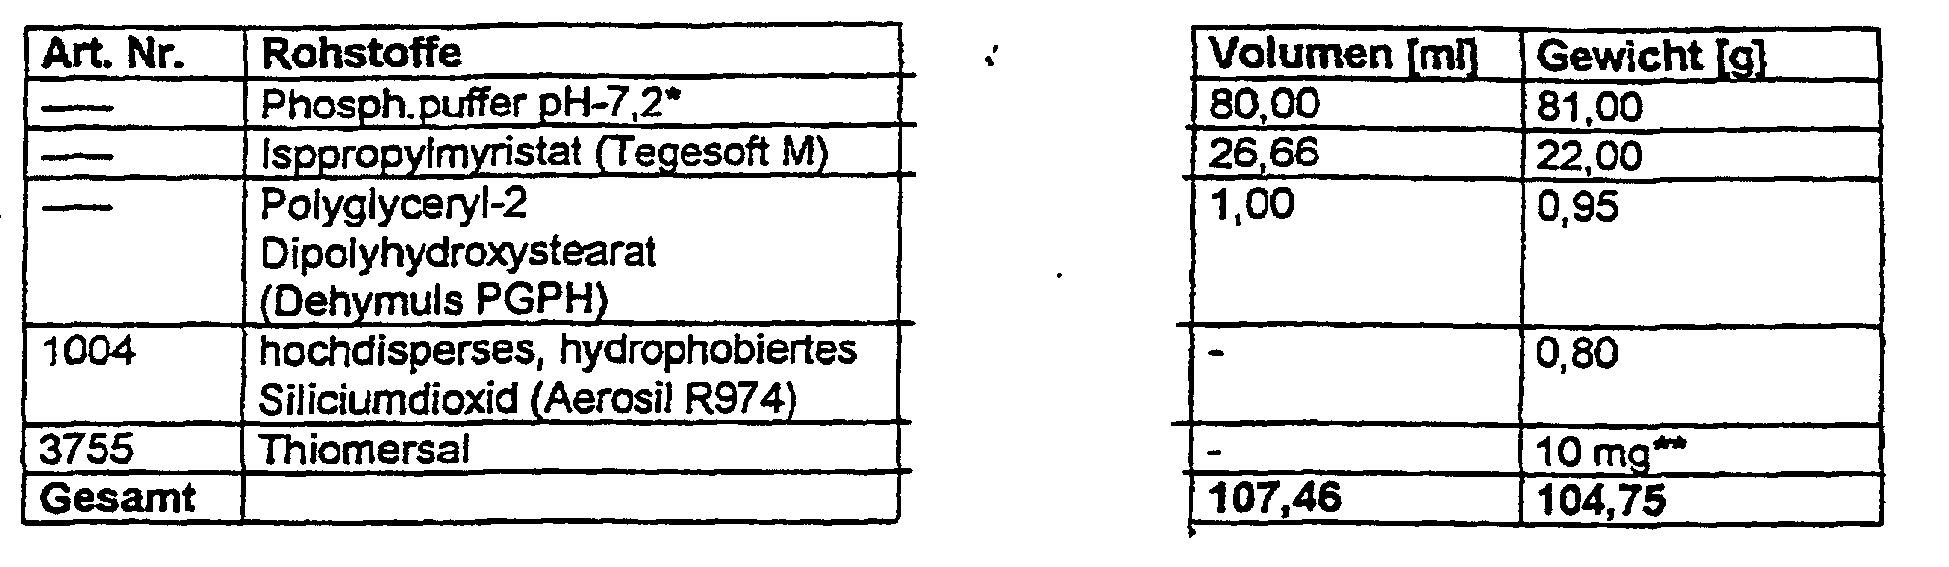 EP1179349B1 - W/O emulsion adjuvant compositions for